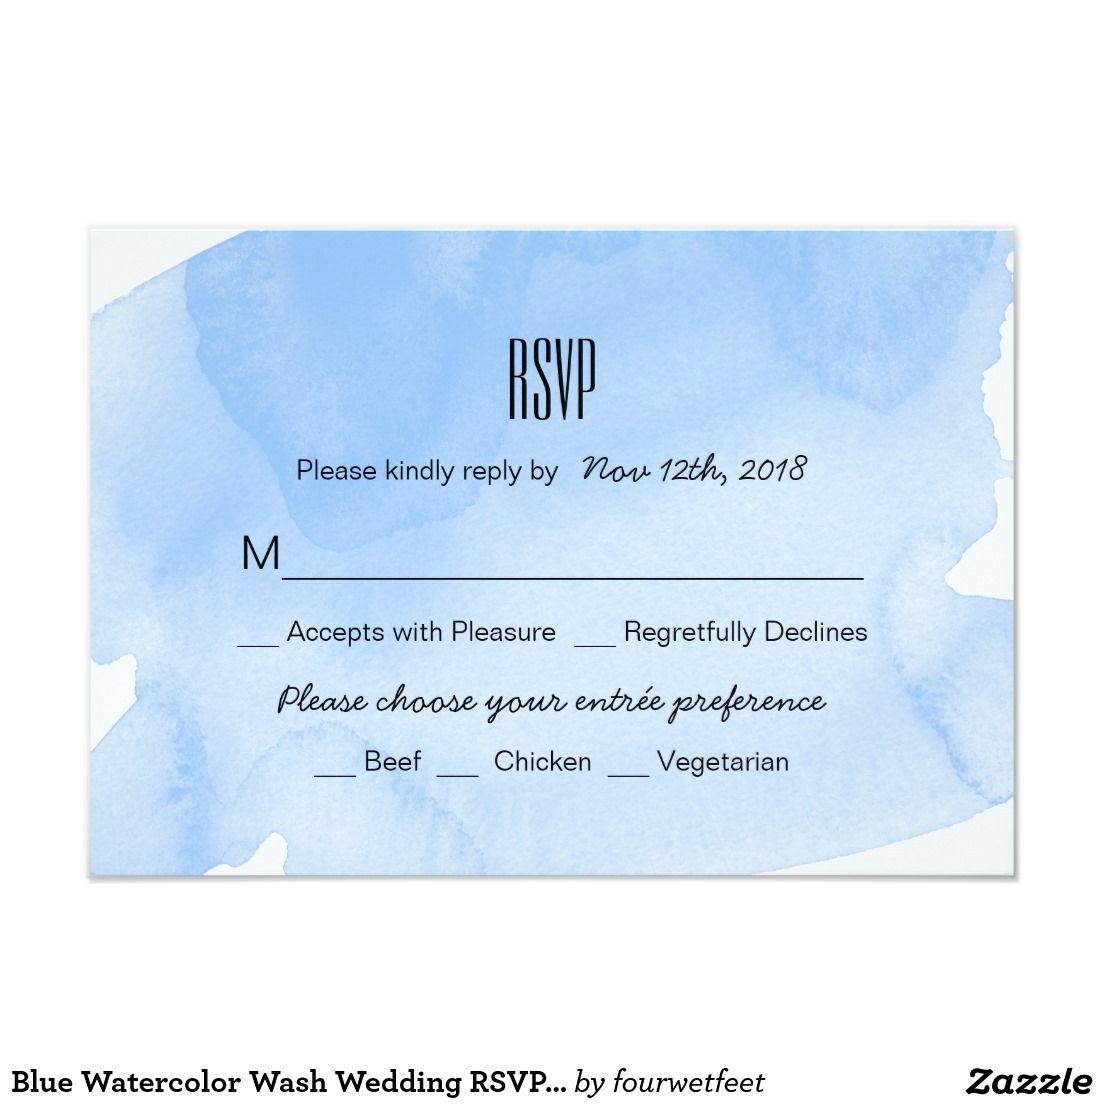 Blue Watercolor Wash Wedding RSVP Card